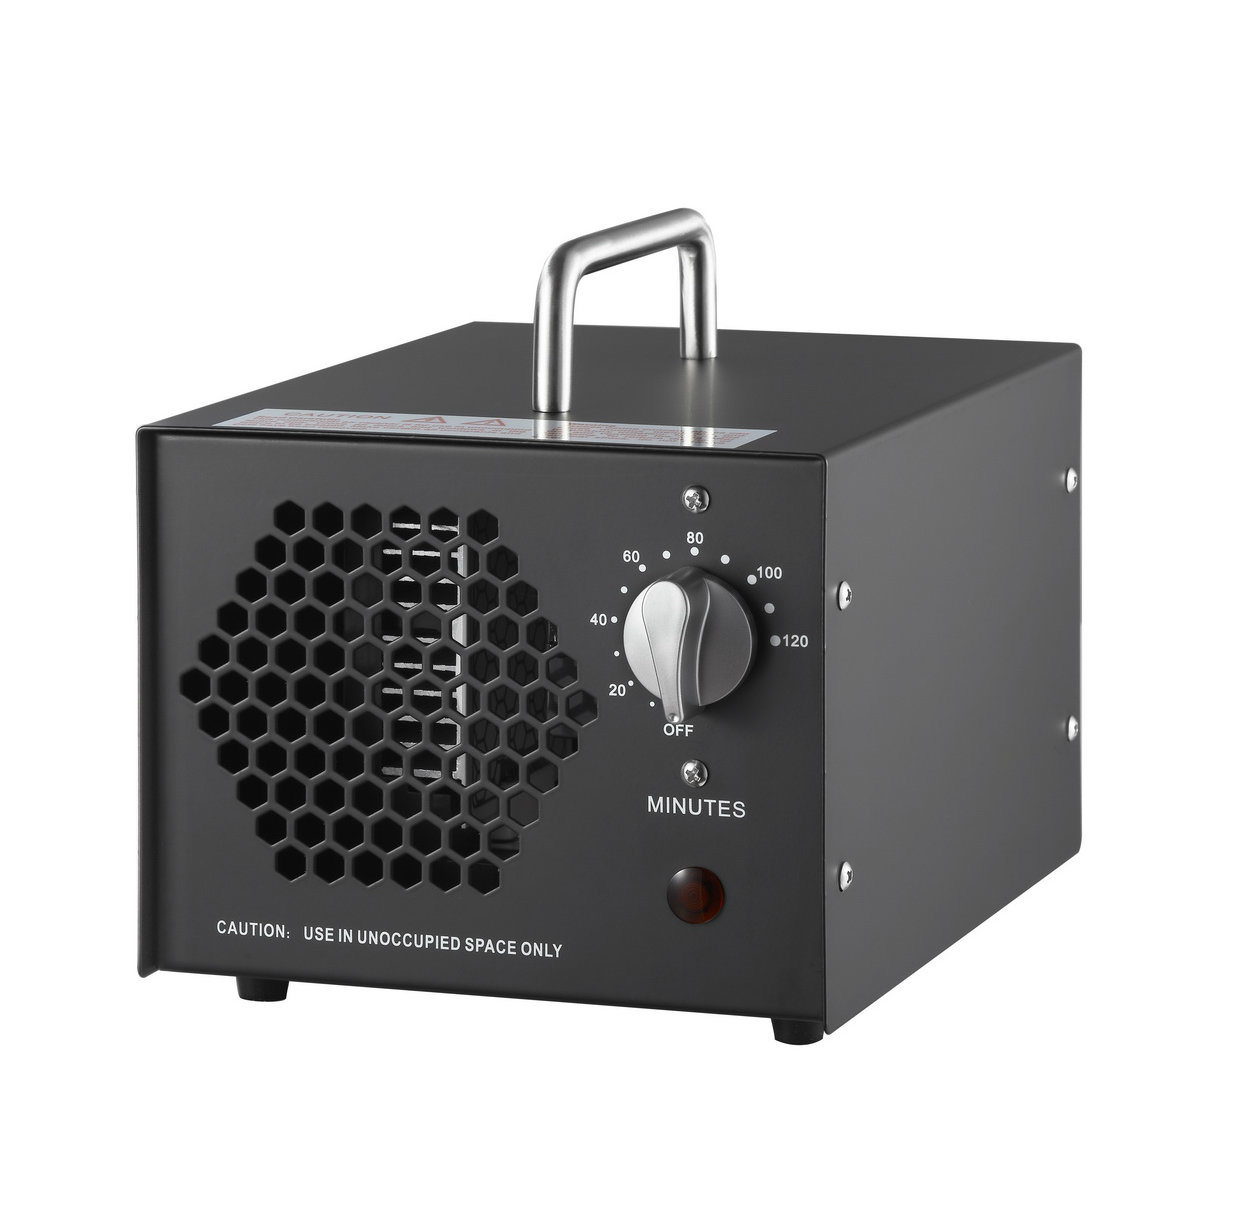 5g Ozone Machine 220-240V -Removes Dust, Pollen, Cigarette Smoke and Bad Odors